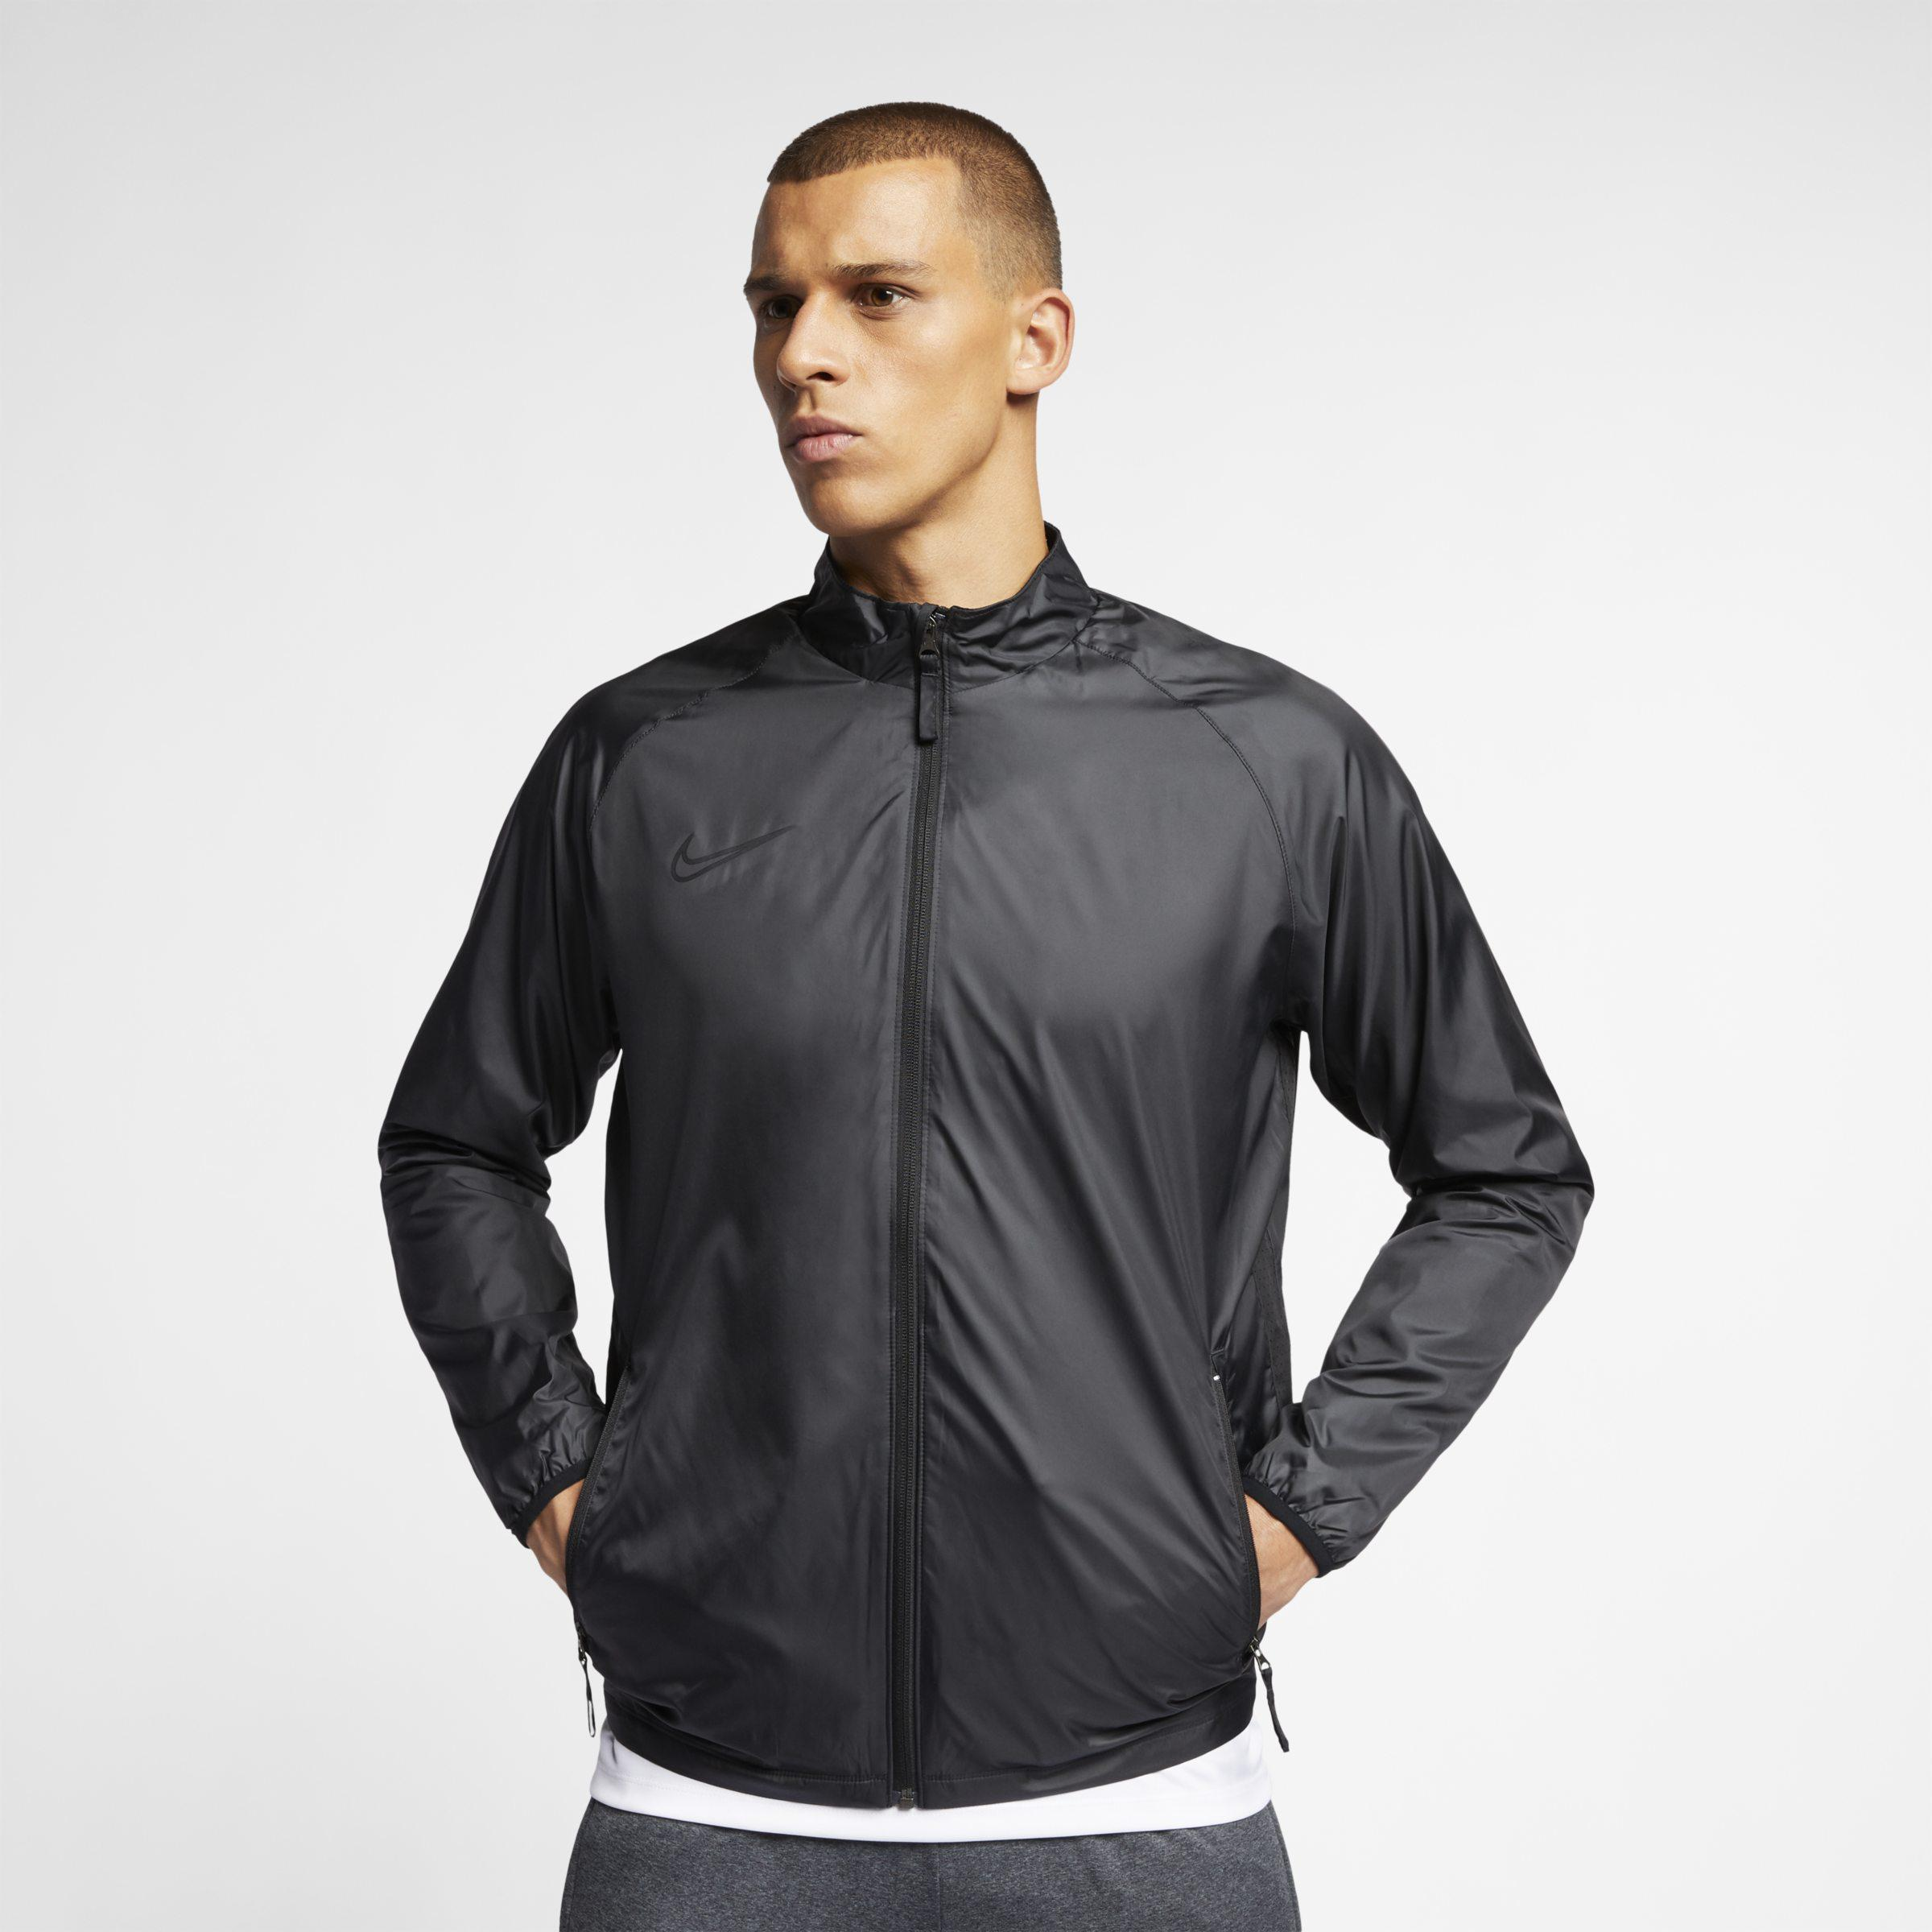 25efa9edc24 Nike Repel Academy Football Jacket in Black for Men - Lyst